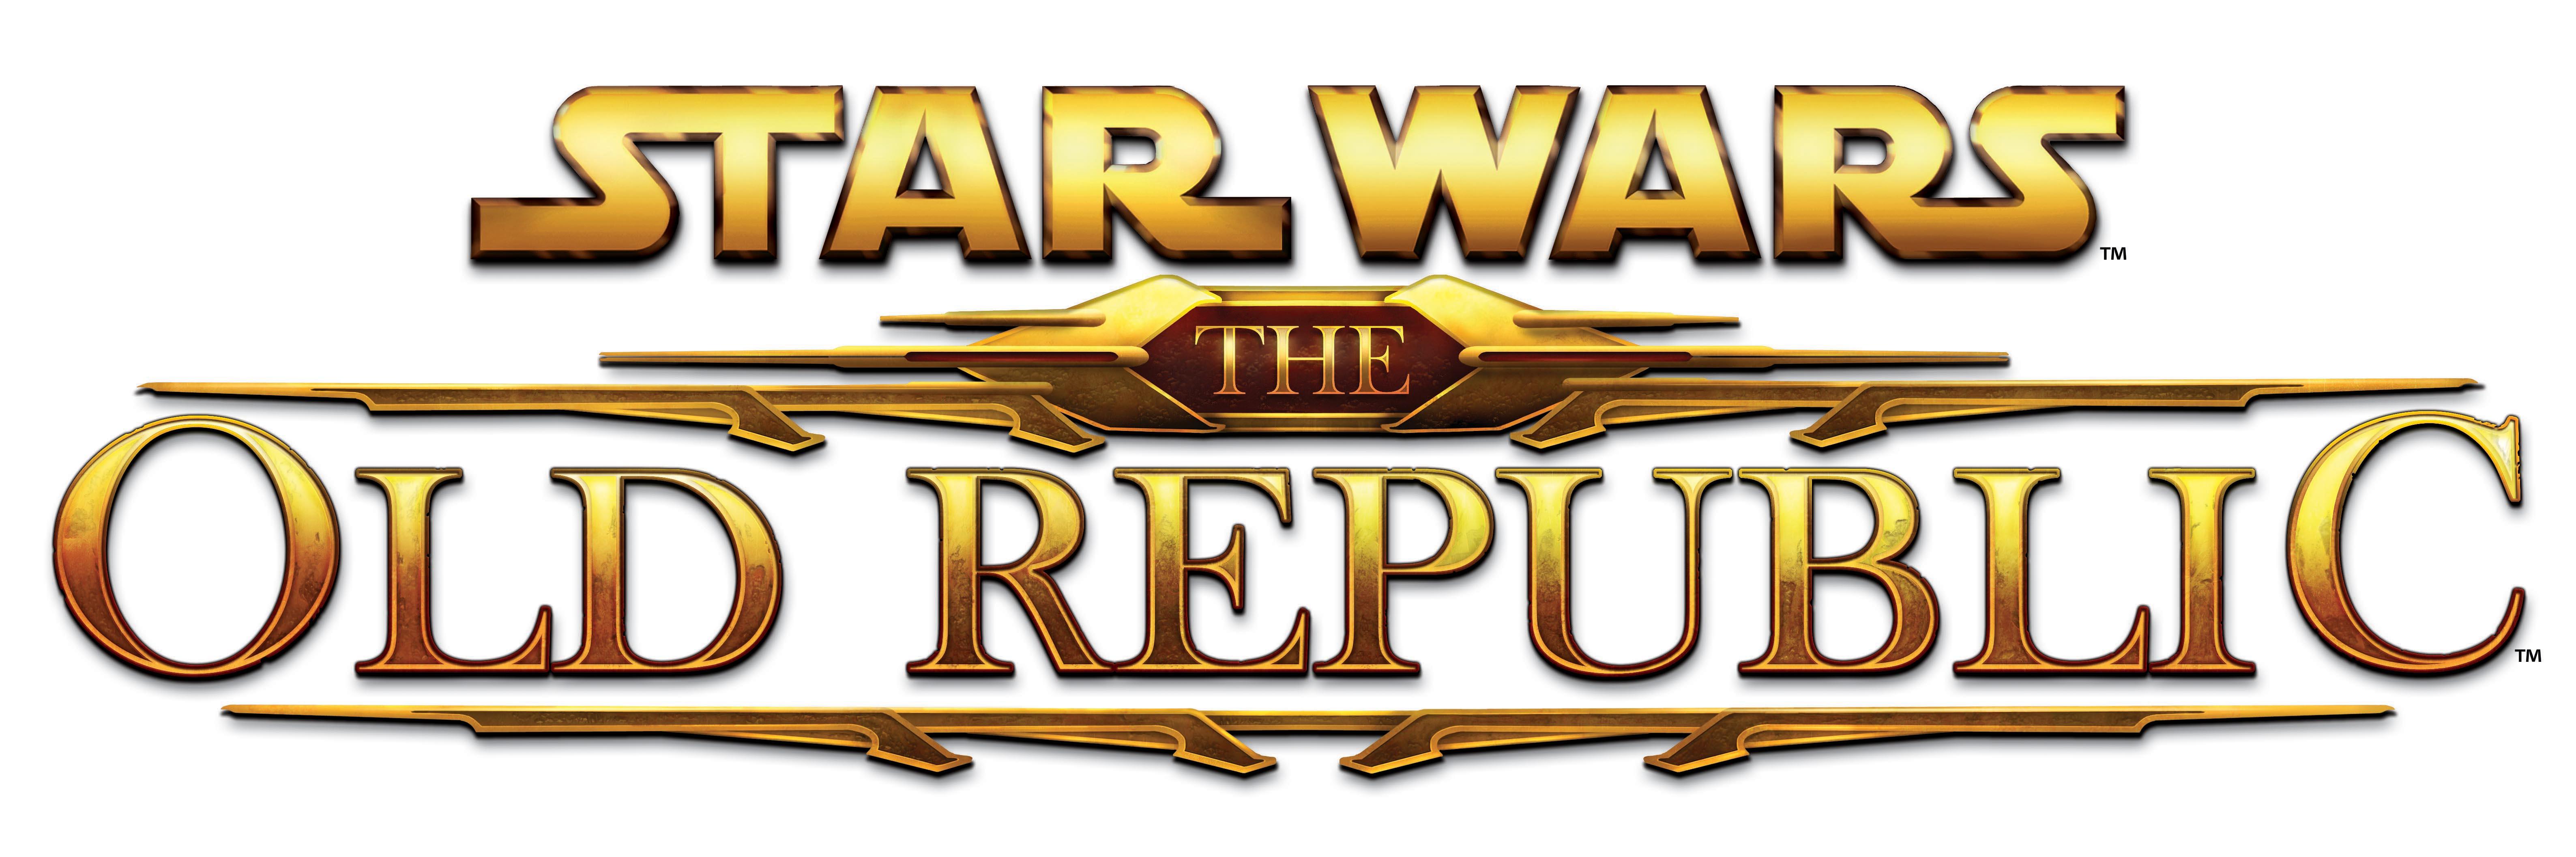 Empire Logo Swtor Image - SWTOR.j...